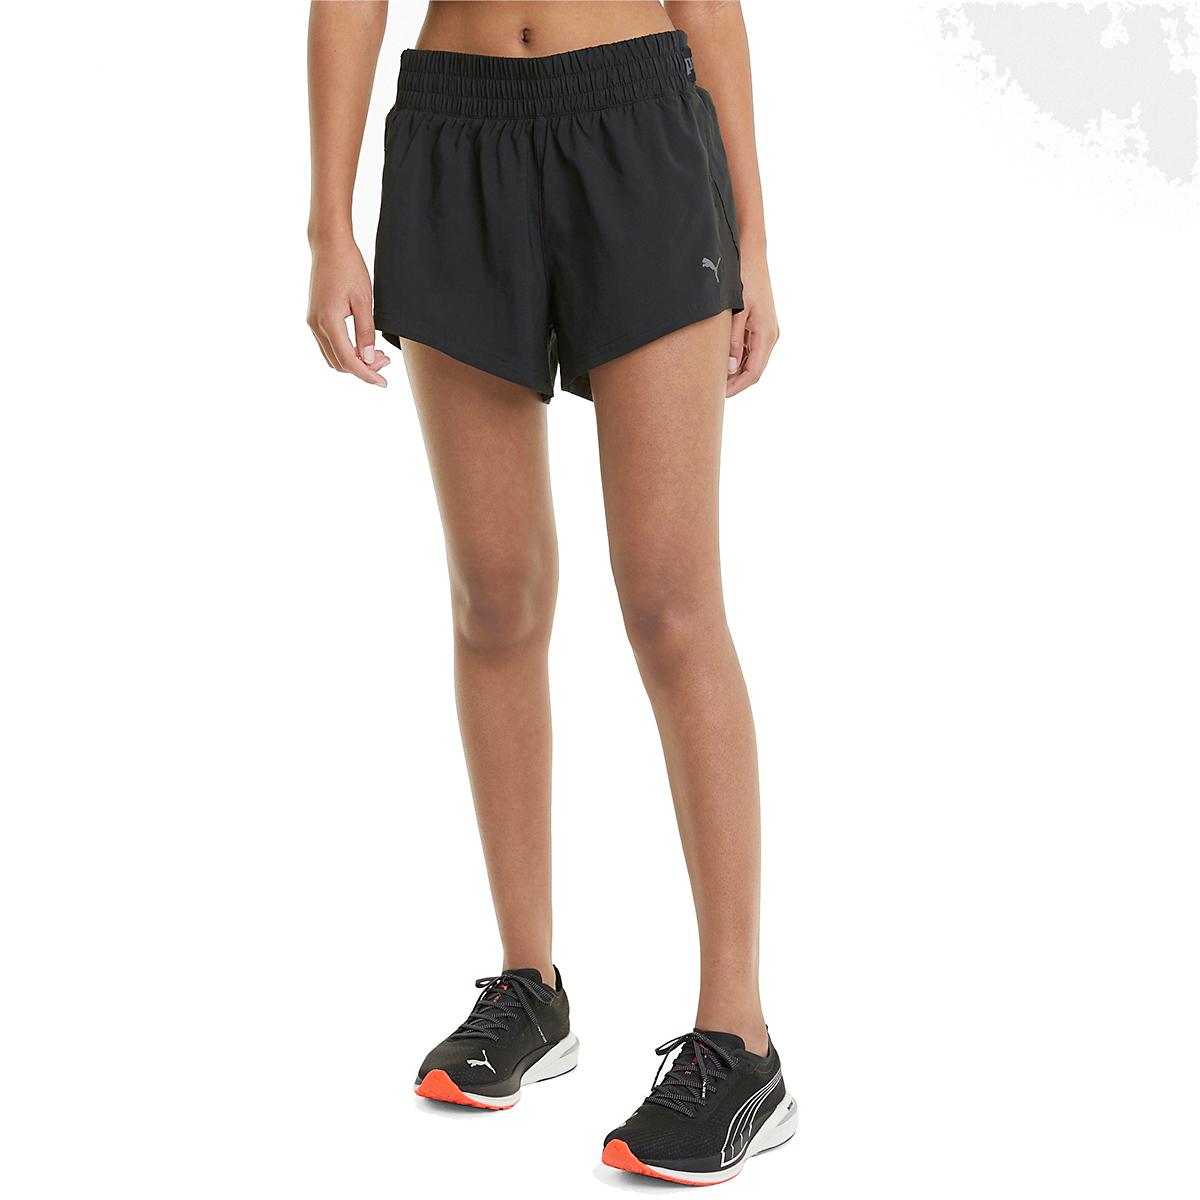 "Women's Puma Run COOLadapt Woven 3"" Short - Color: Puma Black - Size: XS, Puma Black, large, image 1"